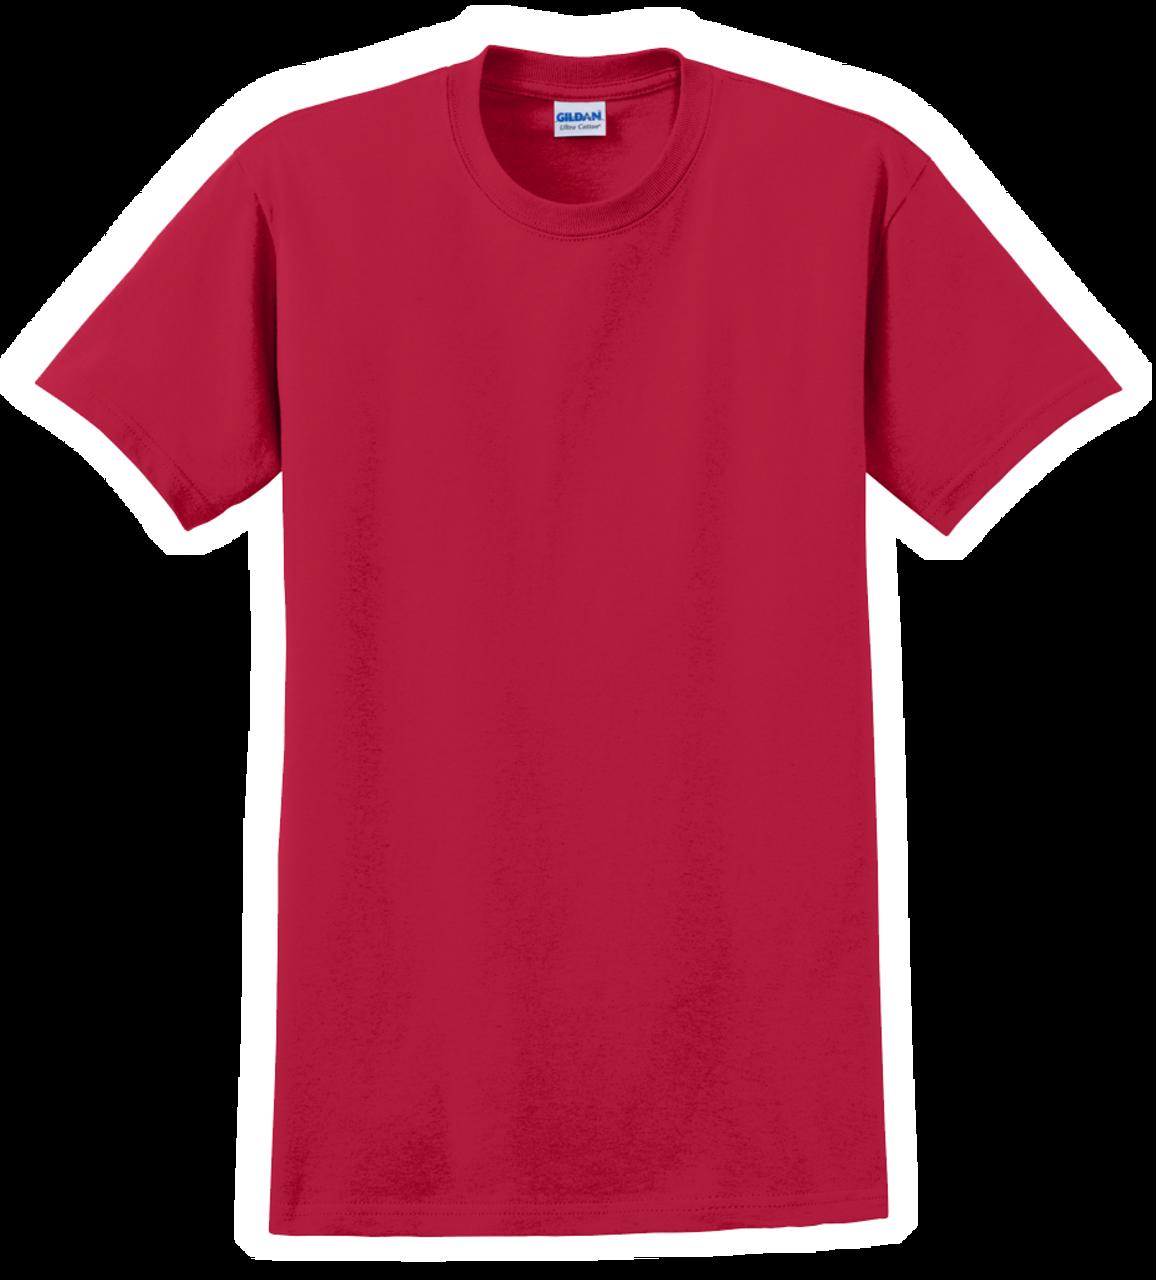 G2000 Cherry Red T-Shirt Short Sleeve by Gildan